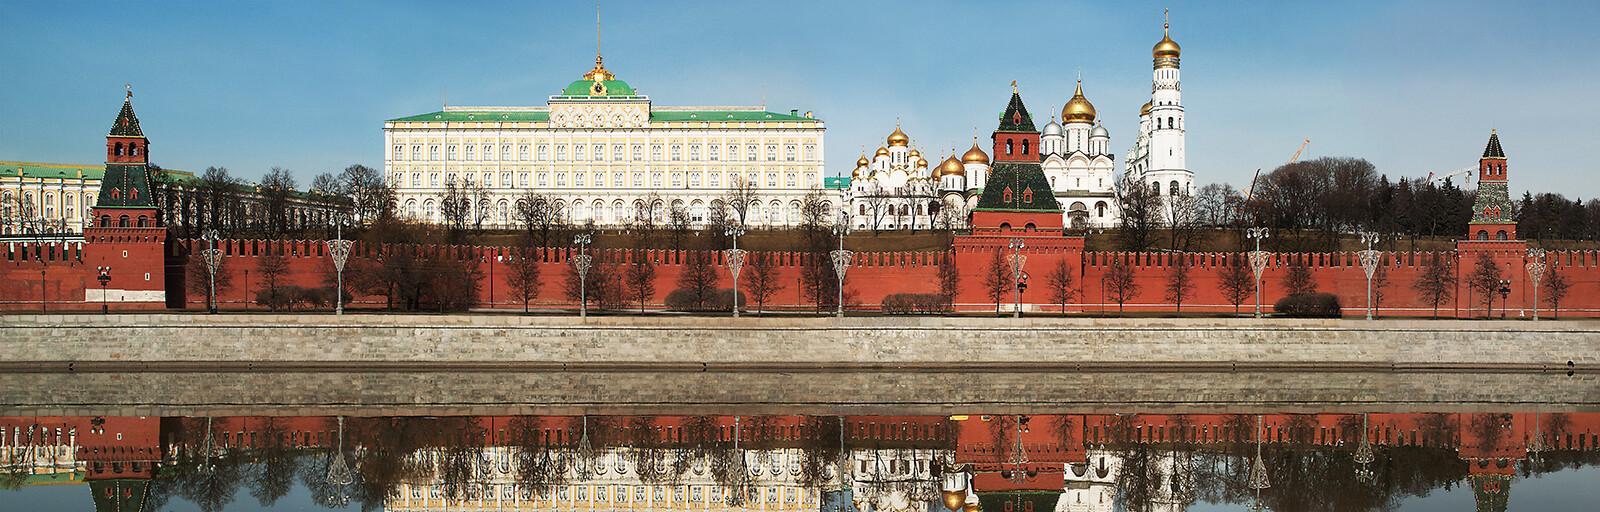 Moscow, Kremlevskaya Embankment - Larry Yust